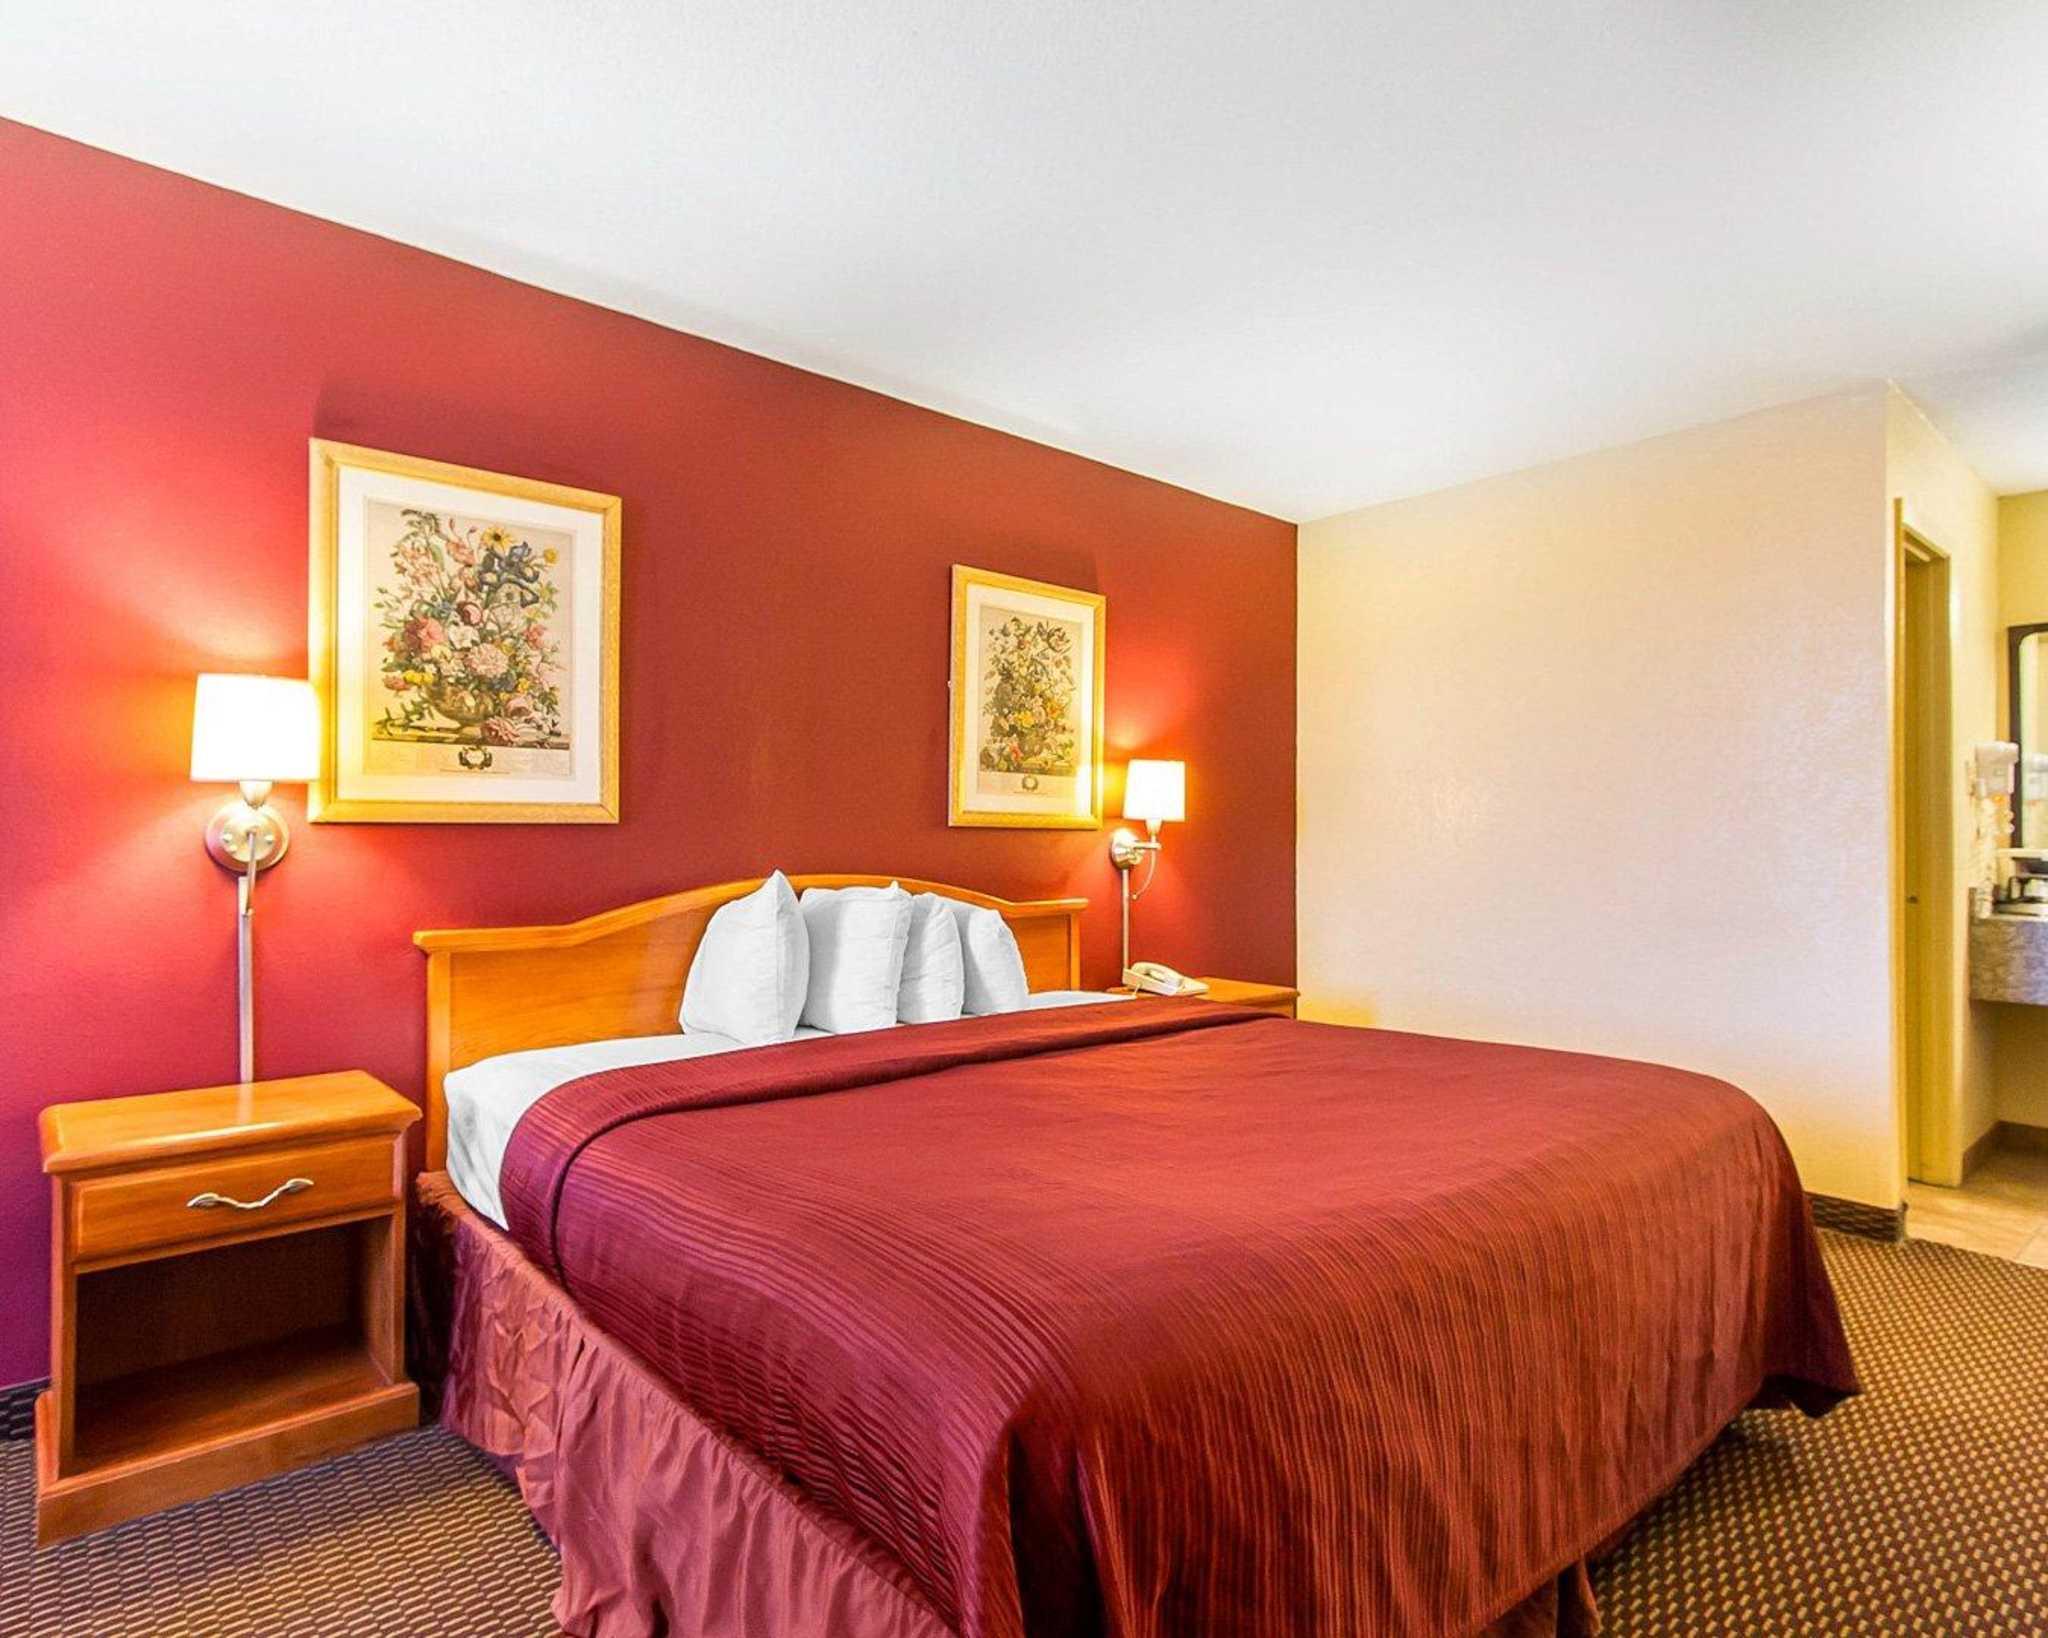 Millington Tn Hotels Motels